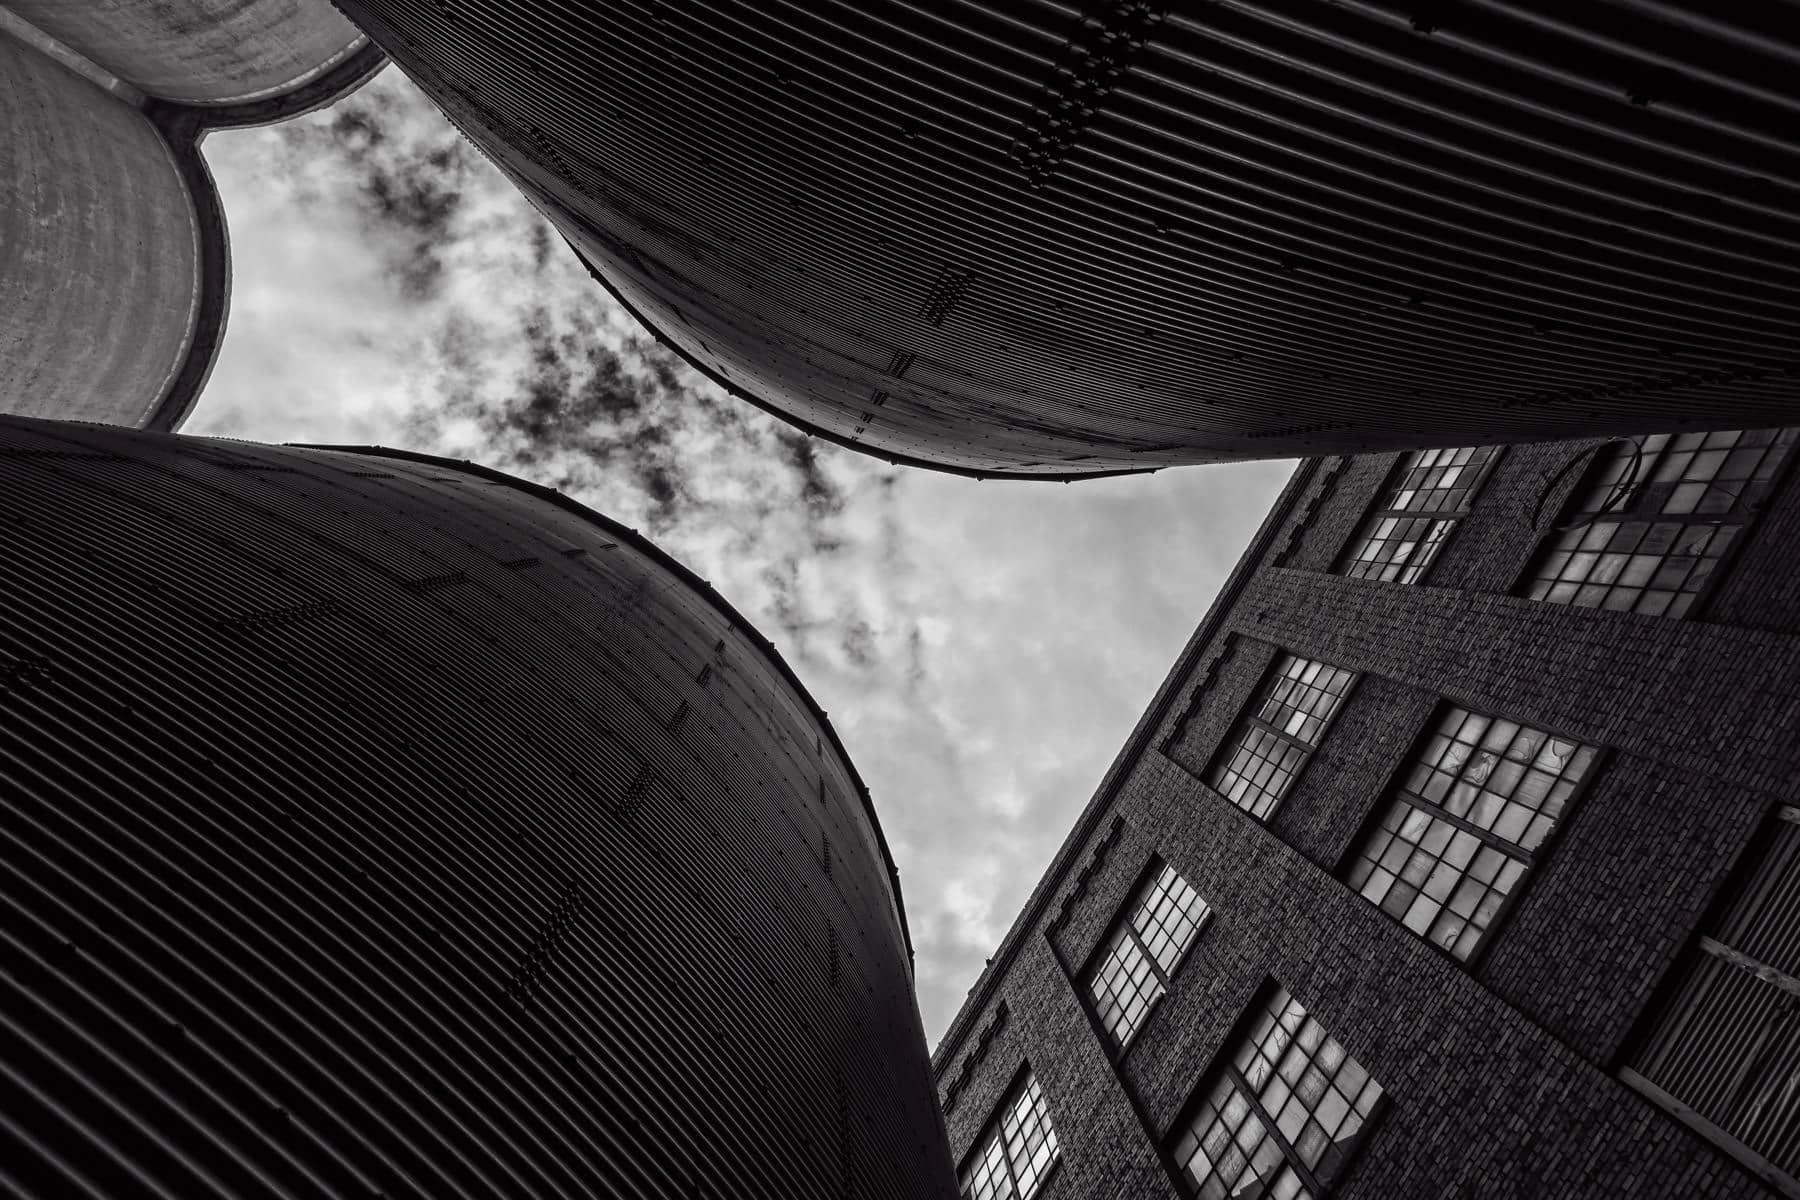 Grain silos and a rundown warehouse spotted near Downtown McKinney, Texas.